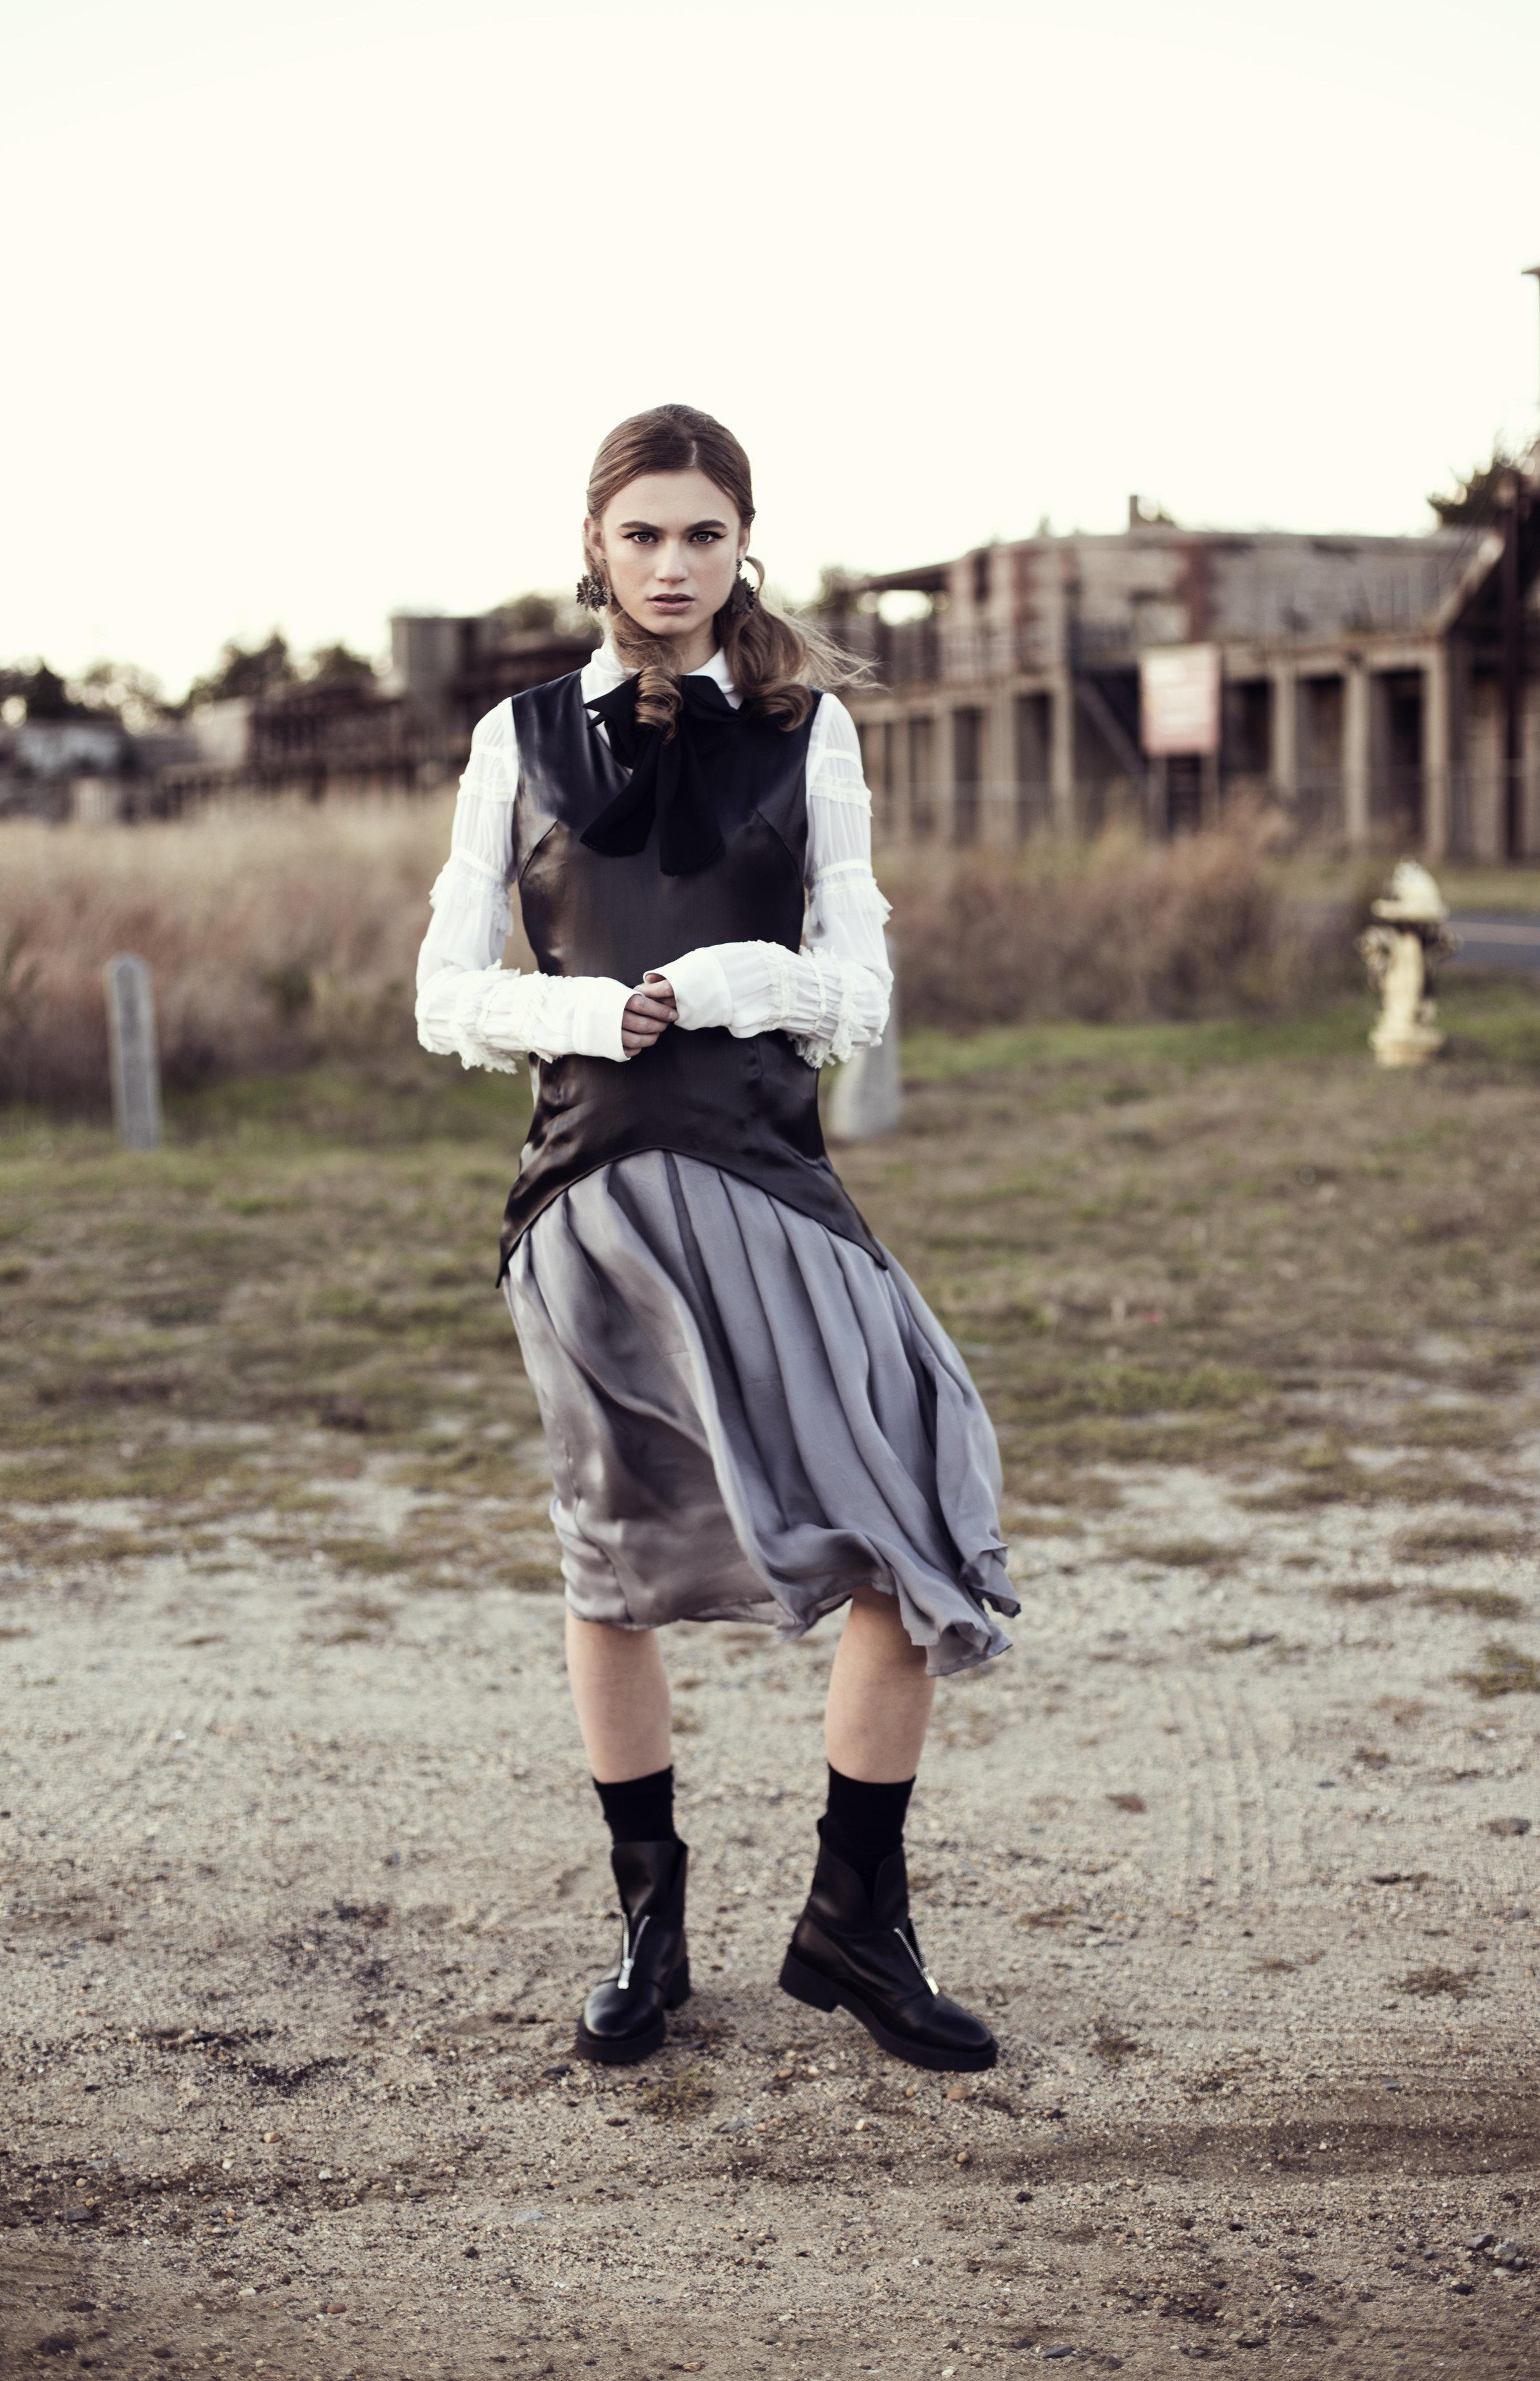 Top: Comme des Garçons for H&M, Bow: ASOS,Earrings: Deepa Gurmani, Dress: Vivienne Hu, Shoes: Zara